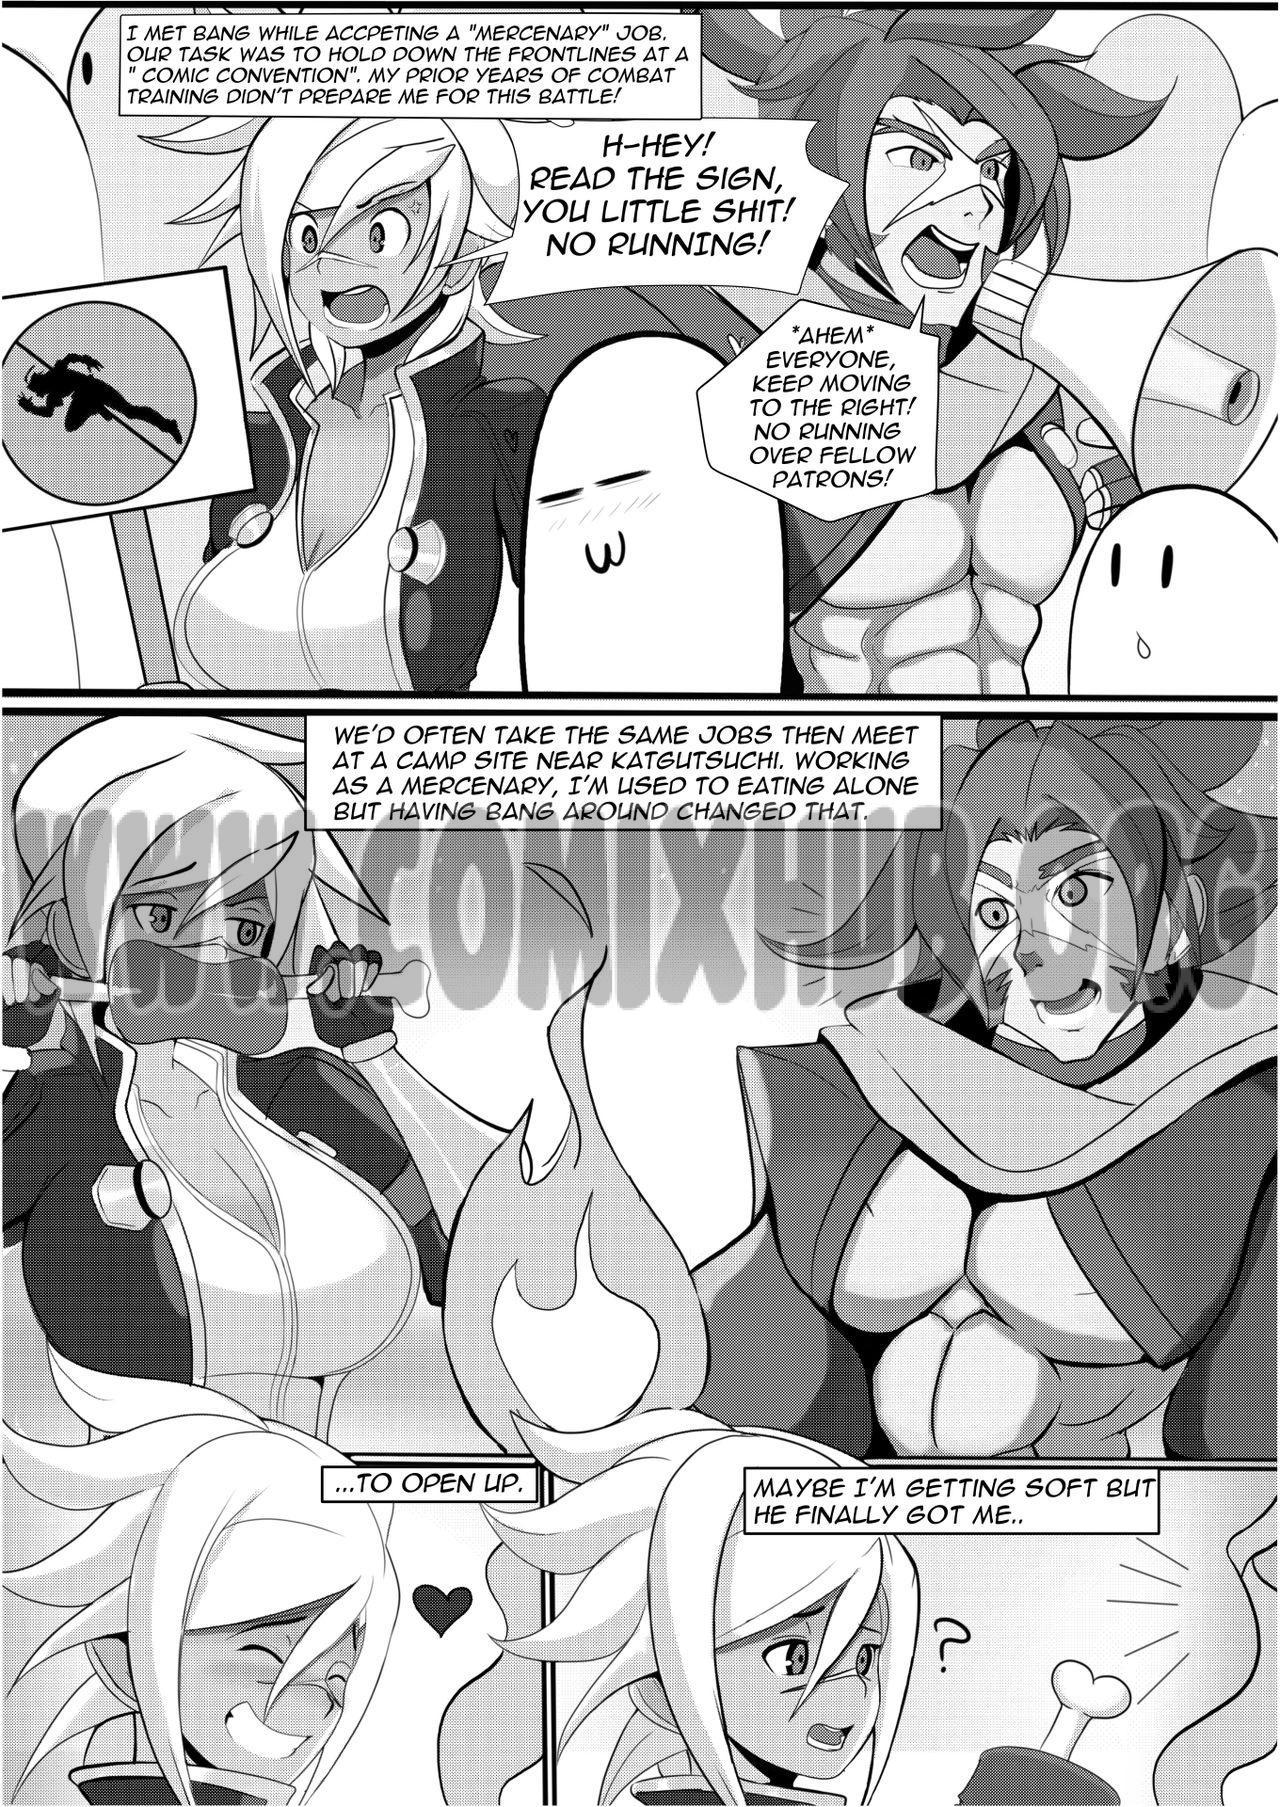 Afterburner Level 2 porn comics Oral sex, Big Tits, Blowjob, Creampie, Cum Swallow, Straight, Titfuck, X-Ray